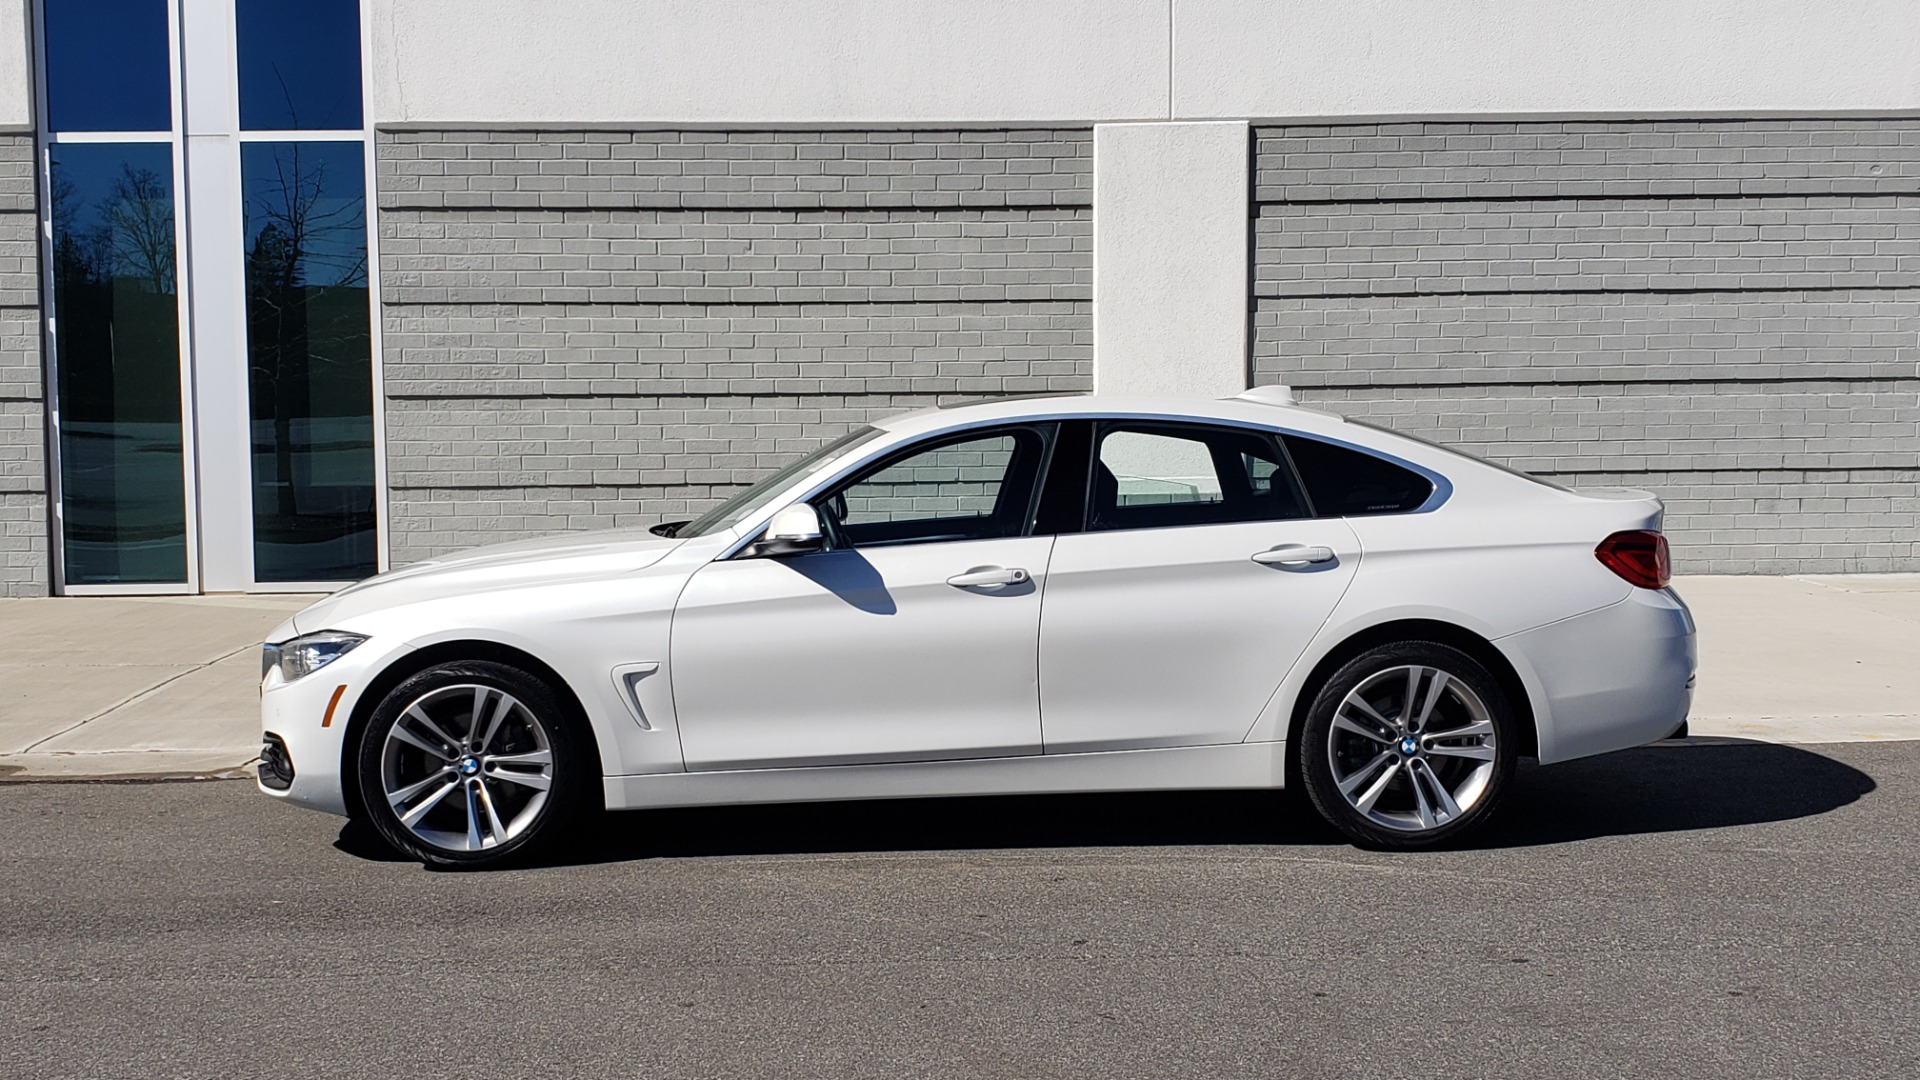 Used 2018 BMW 4 SERIES 430IXDRIVE / PREMIUM / NAV / SUNROOF / ESSENTIALS PKG for sale $27,795 at Formula Imports in Charlotte NC 28227 3